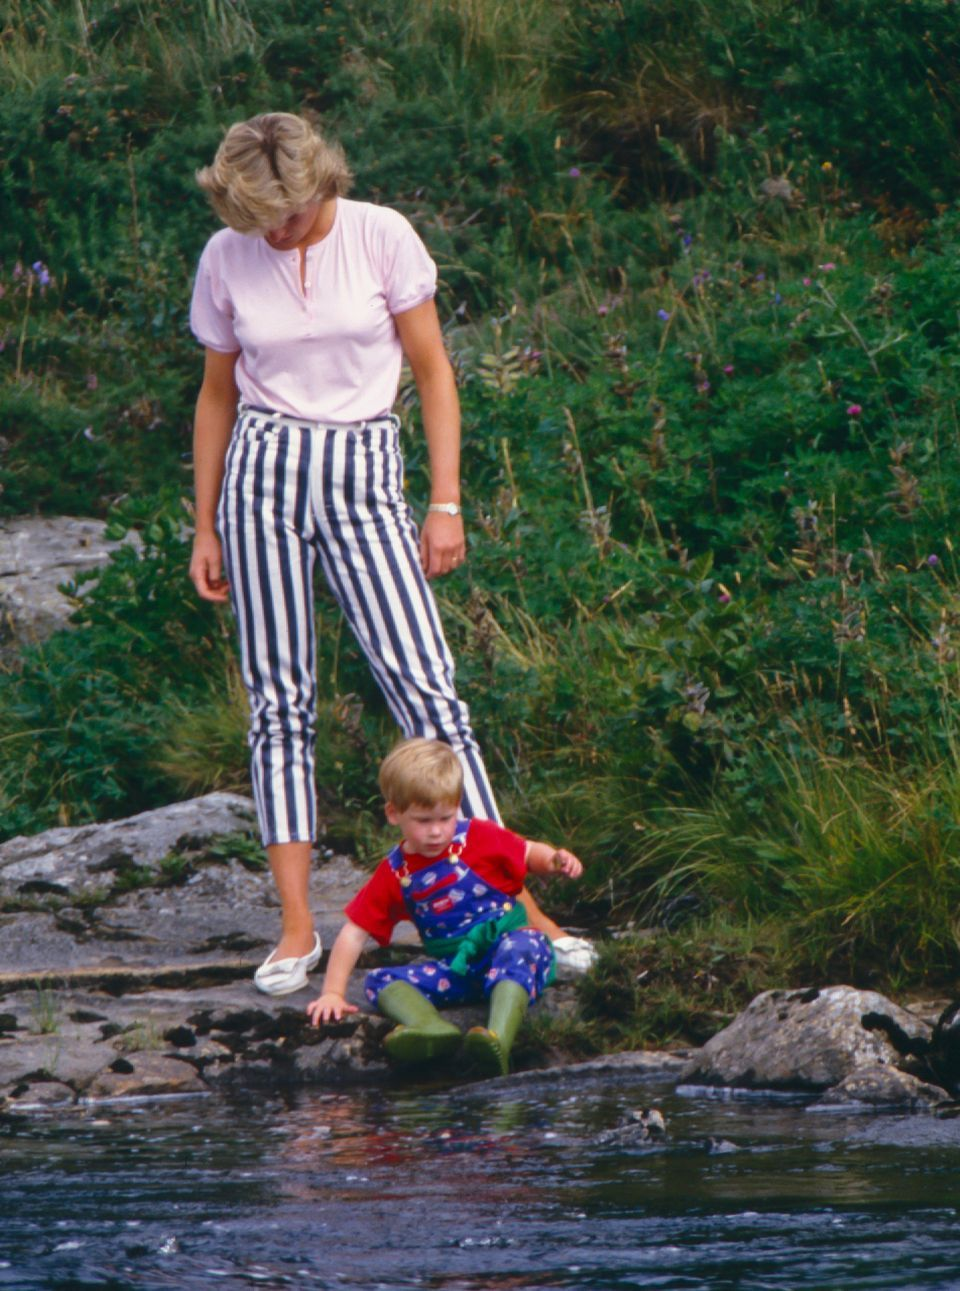 Princess Diana Was Always A Fashion Icon, As These Striking Photos Show | HuffPost Life #princessdiana